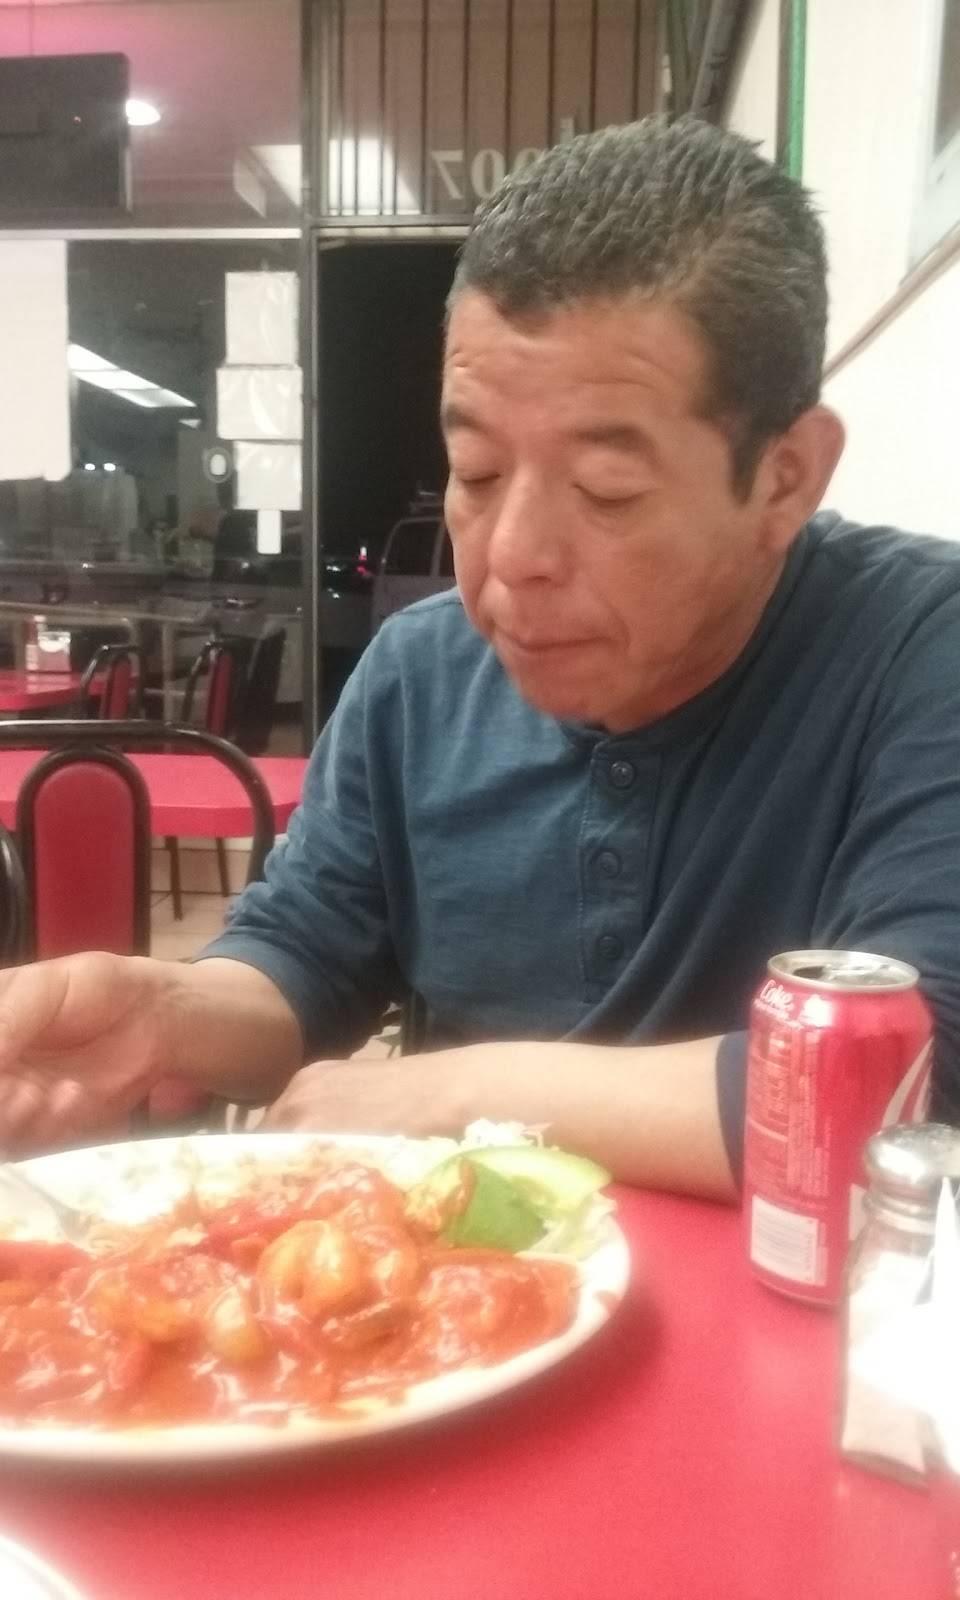 Picantes Mexican Restaurant | restaurant | 913 S Euclid St, Anaheim, CA 92802, USA | 7149914111 OR +1 714-991-4111